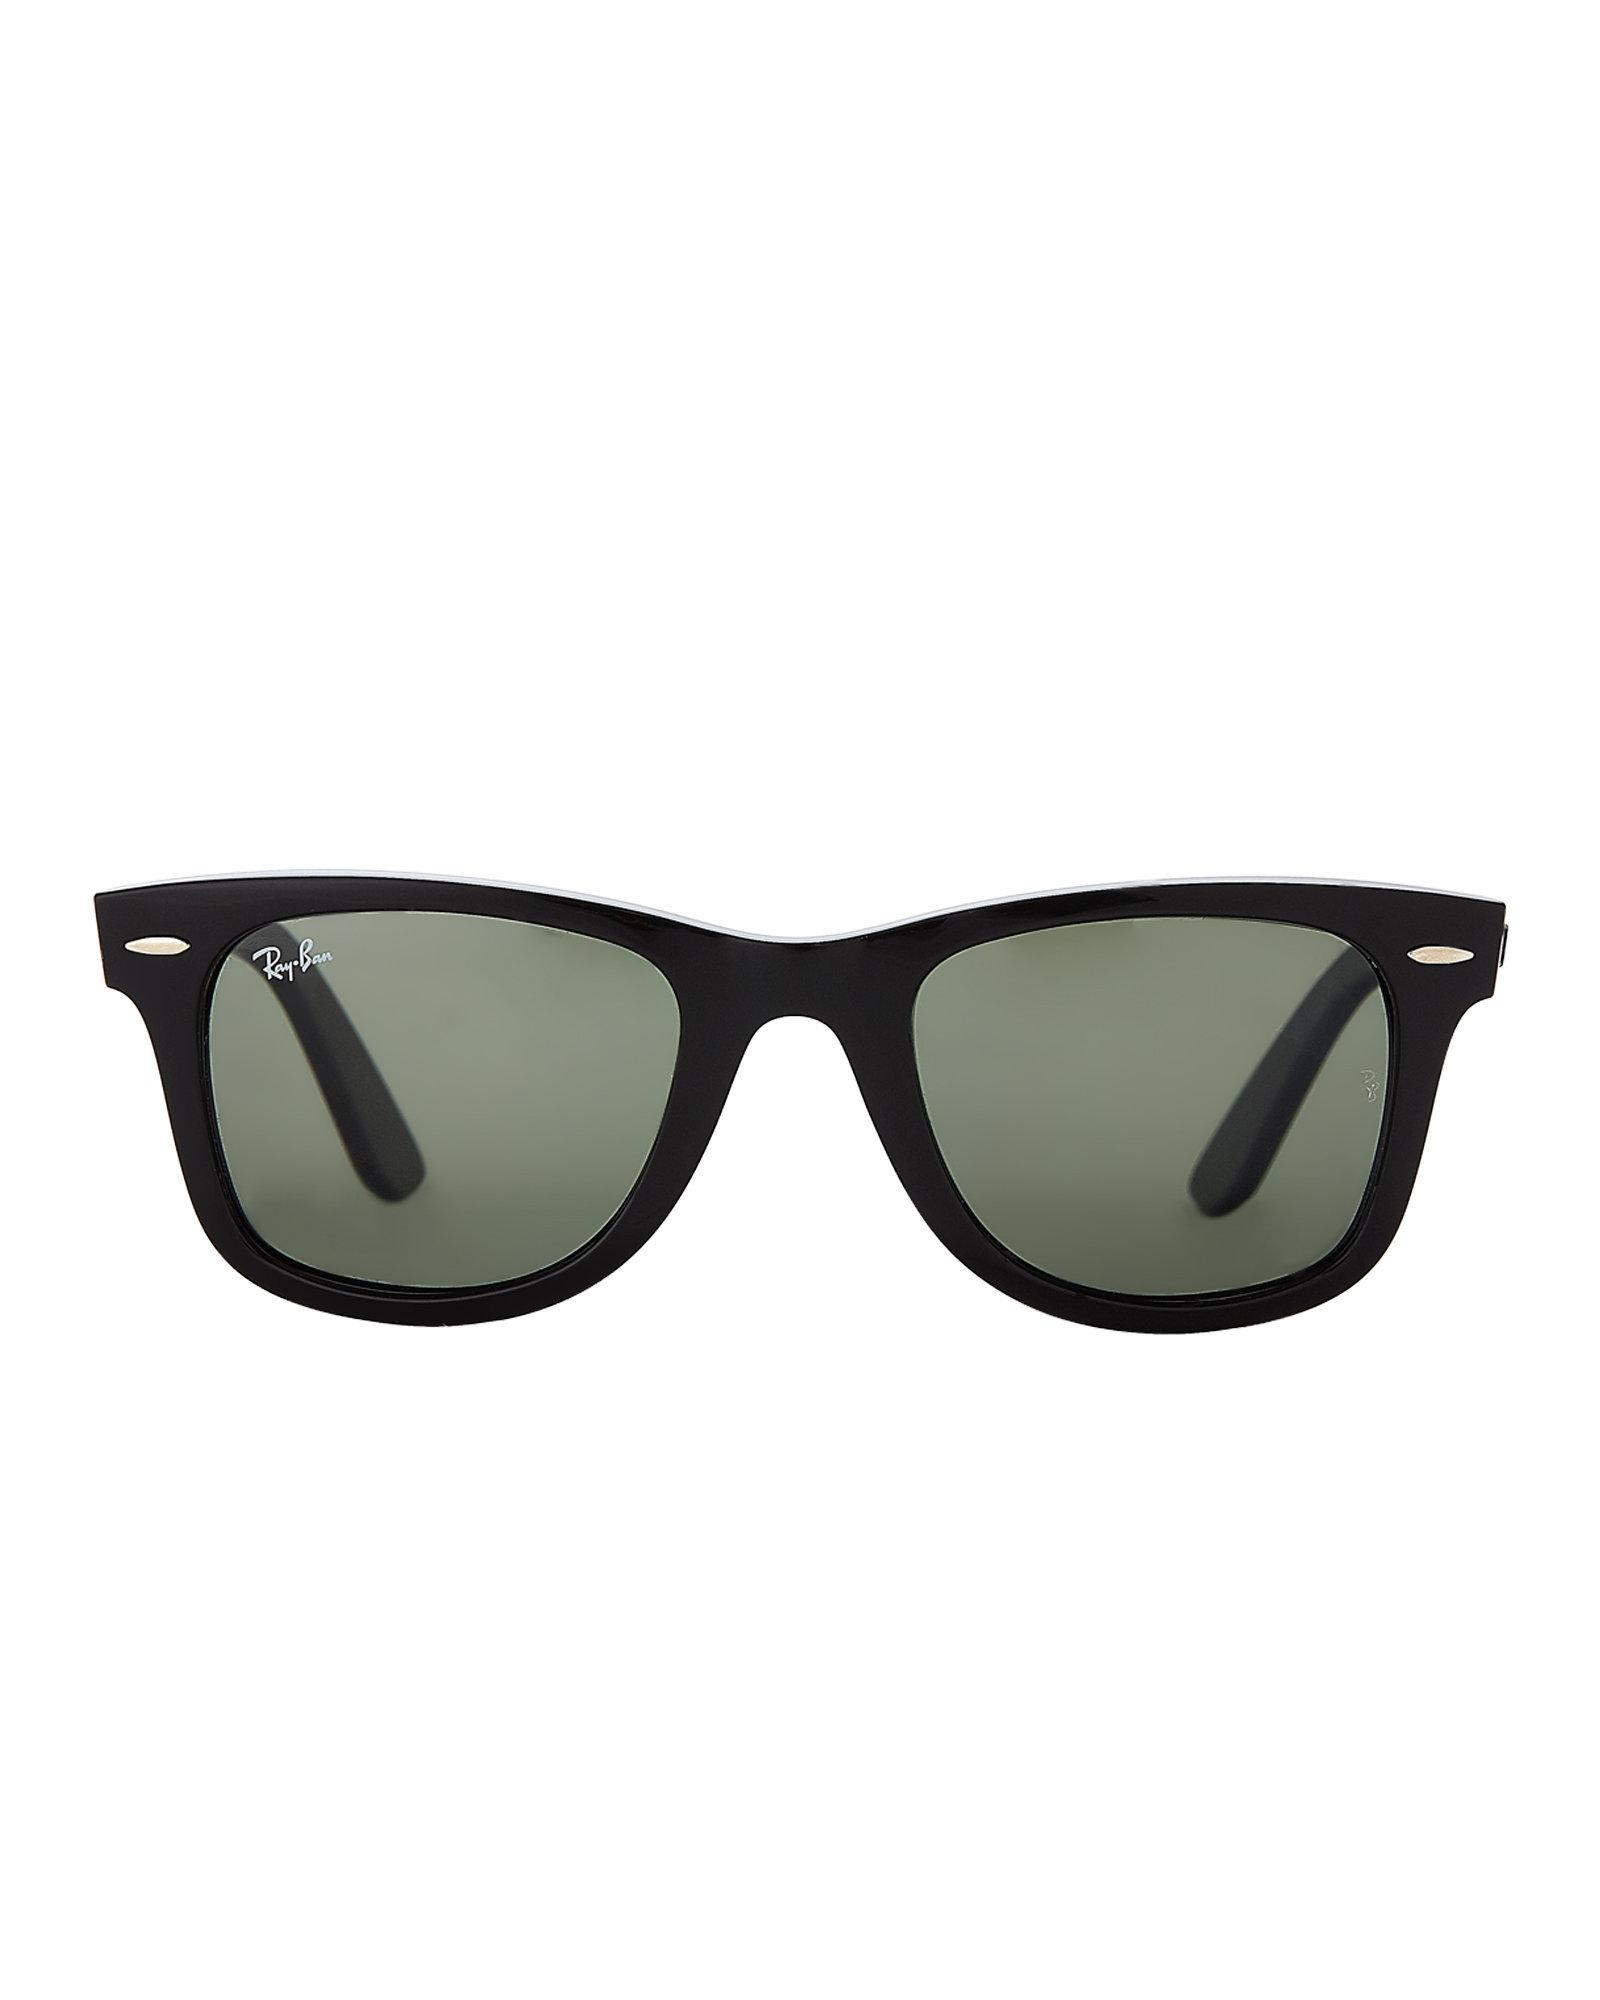 9beffe1eb3 Lyst - Ray-Ban Rb4340 Black Polarized Wayfarer Sunglasses in Black